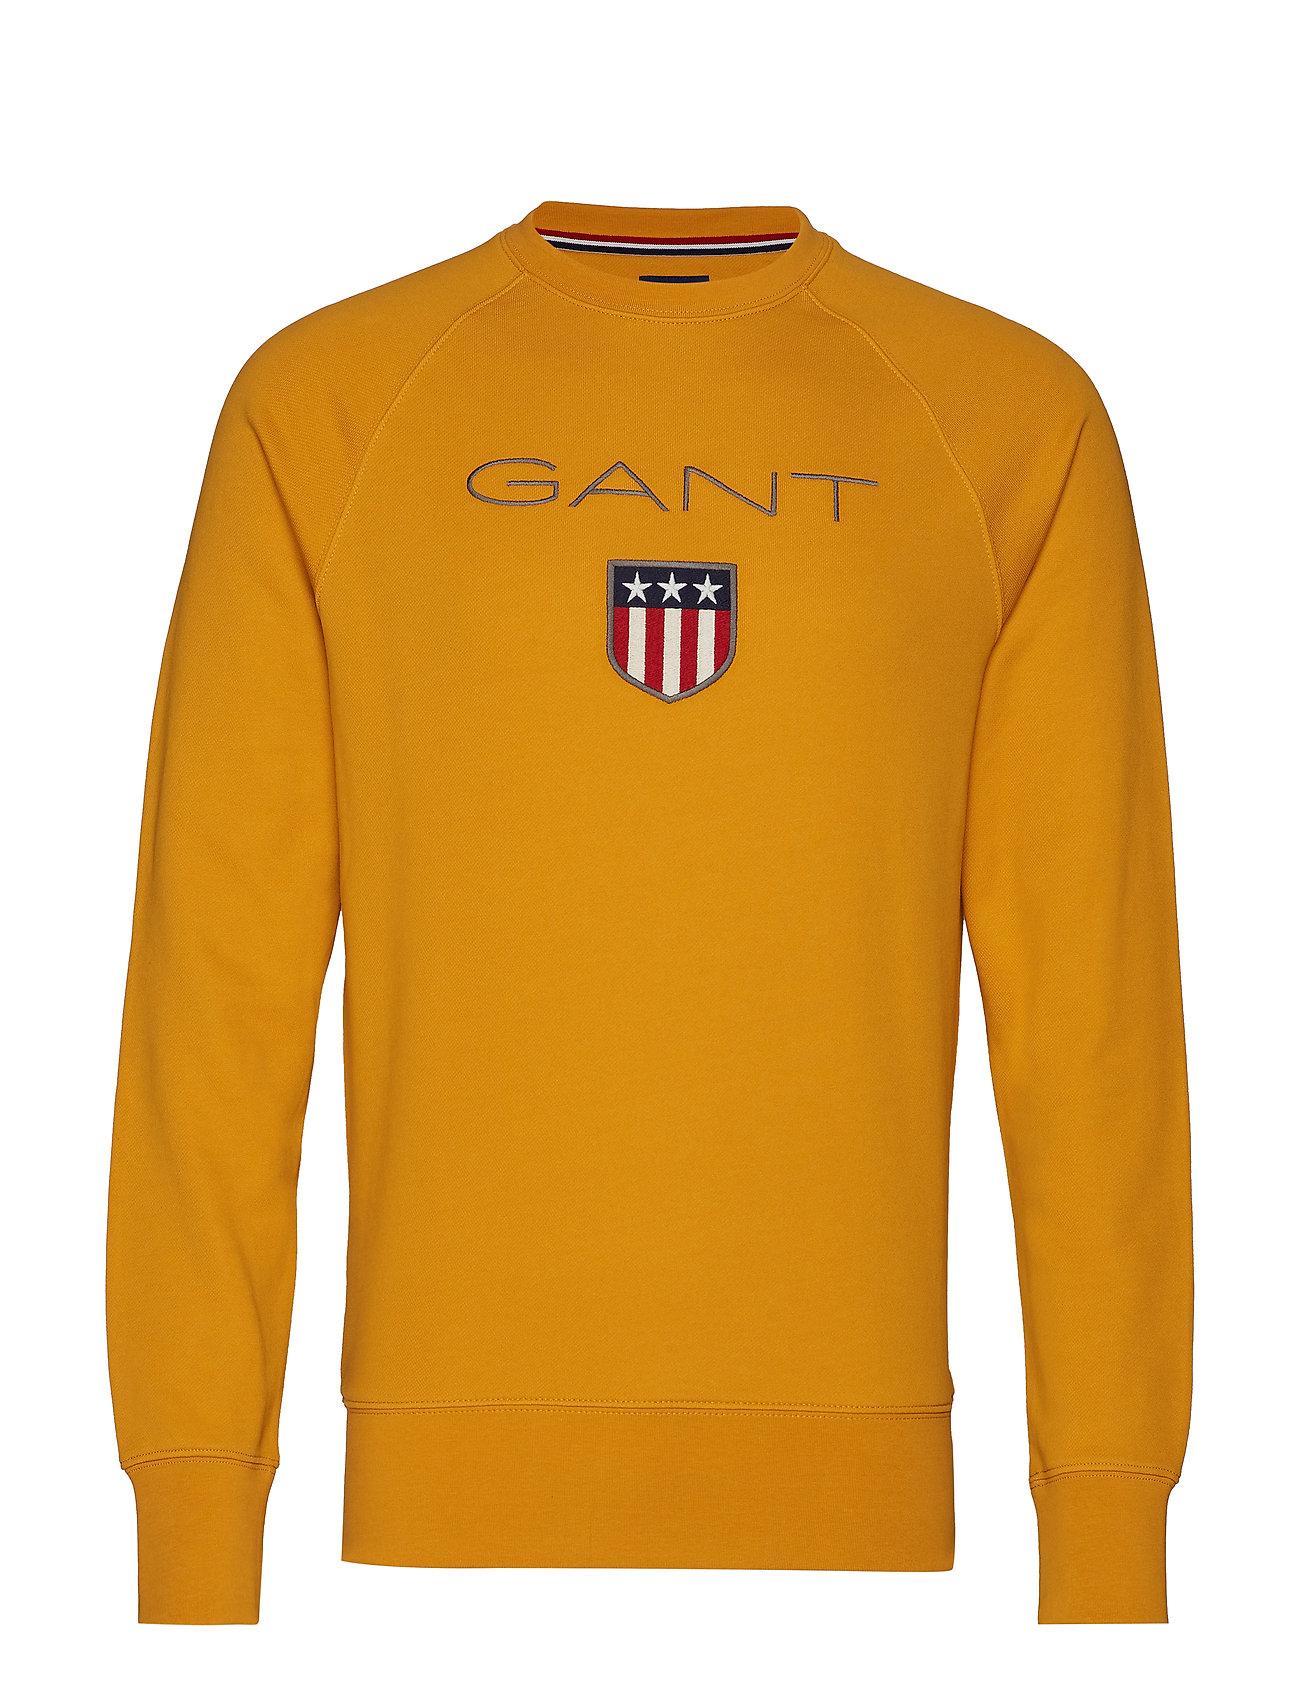 GANT GANT SHIELD C-NECK SWEAT - IVY GOLD